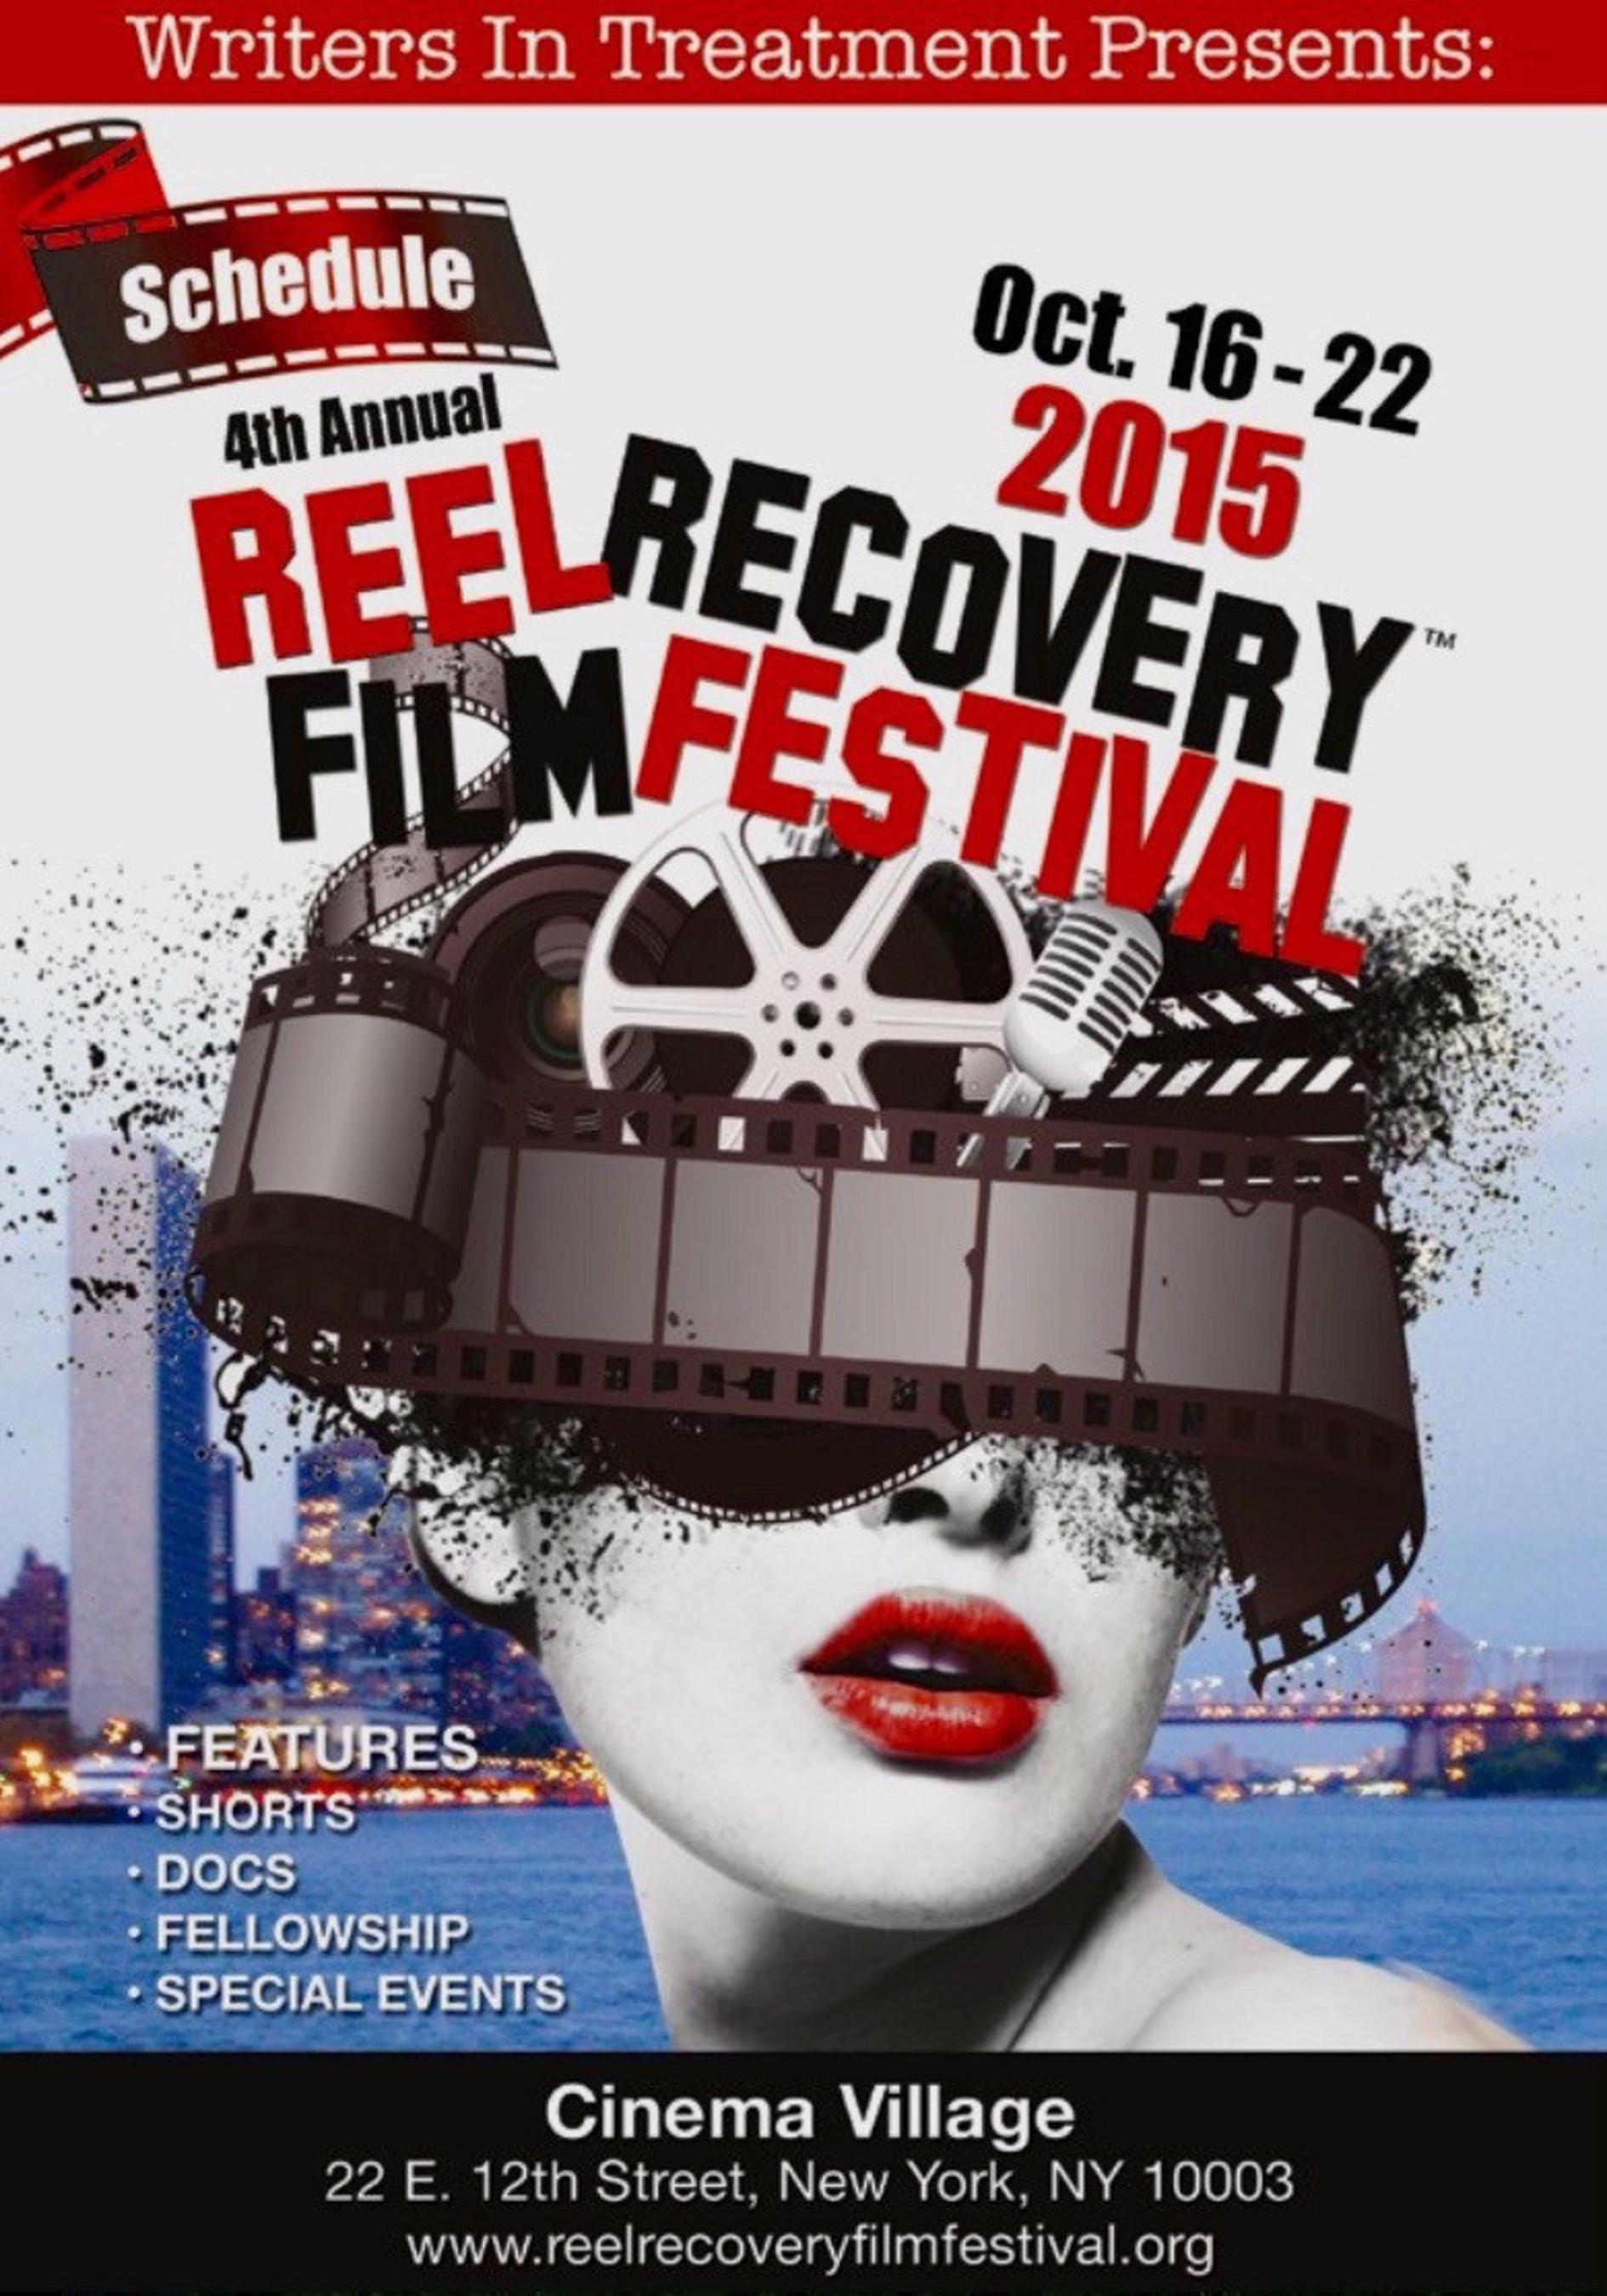 4th Annual REEL Recovery Film Festival, Oct. 16-22, 2015, Cinema Village